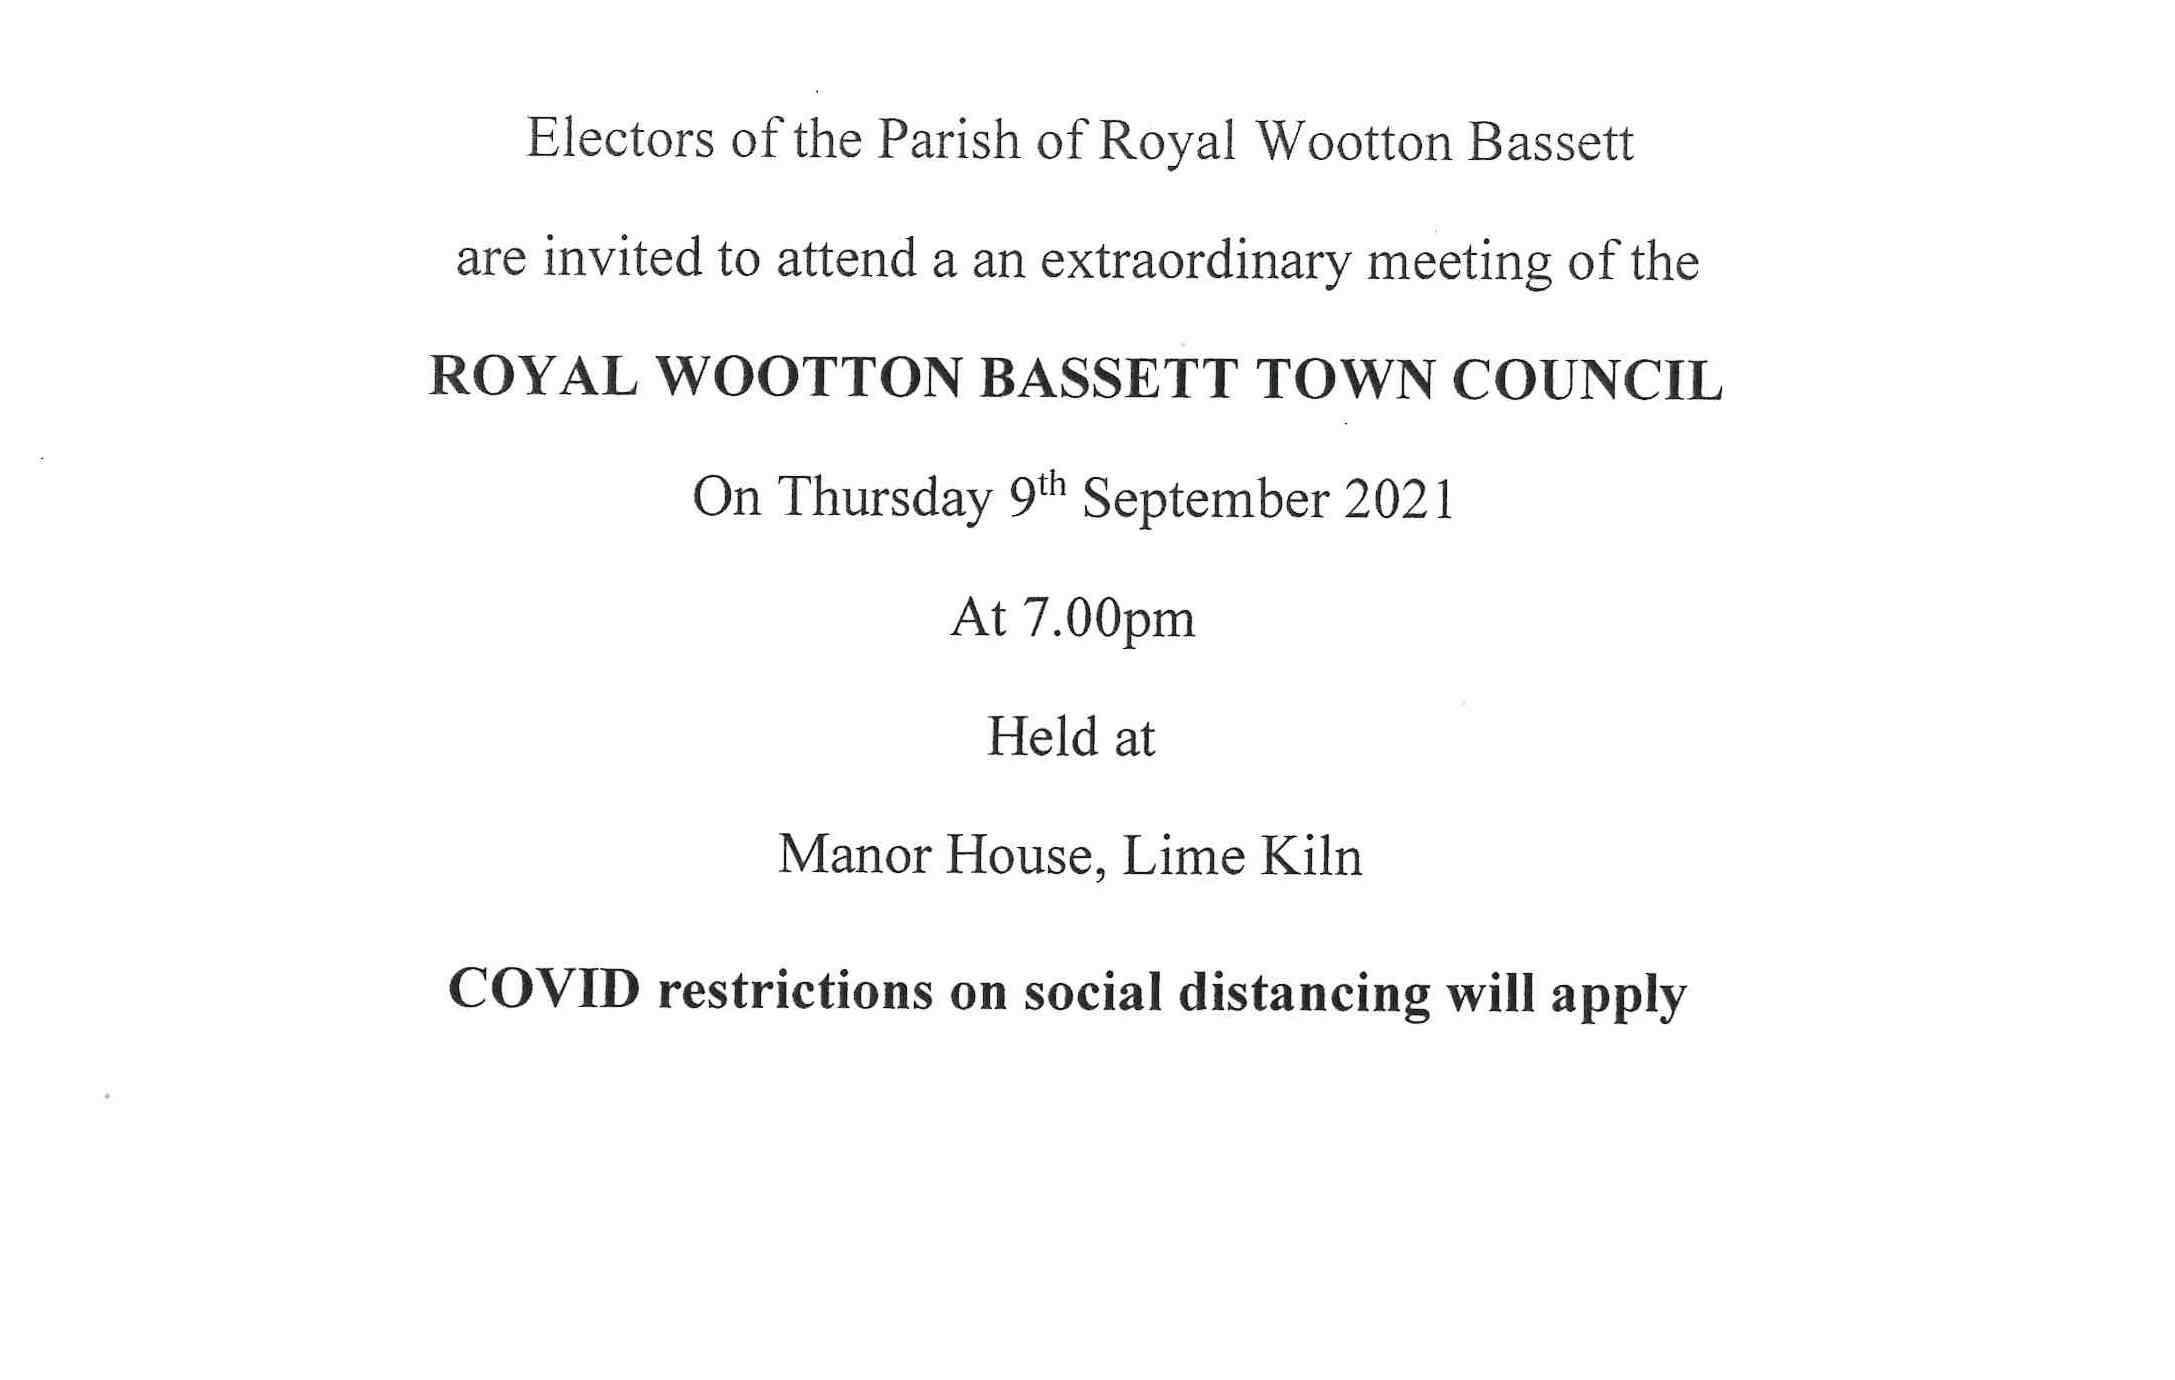 Meeting notice for Thursday 9th September 2021